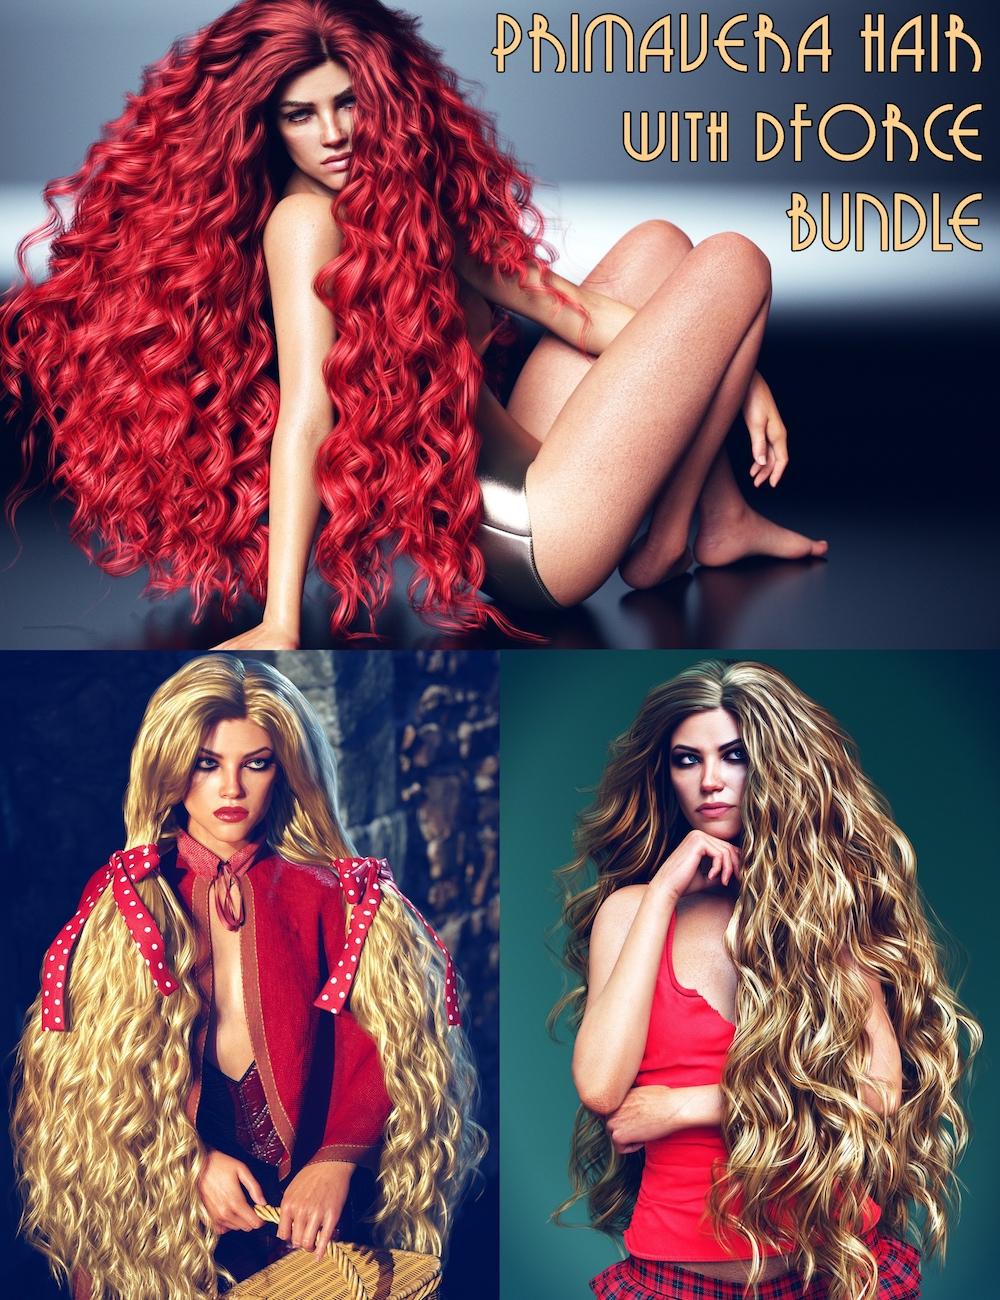 Primavera Hair with dForce Bundle by: Linday, 3D Models by Daz 3D